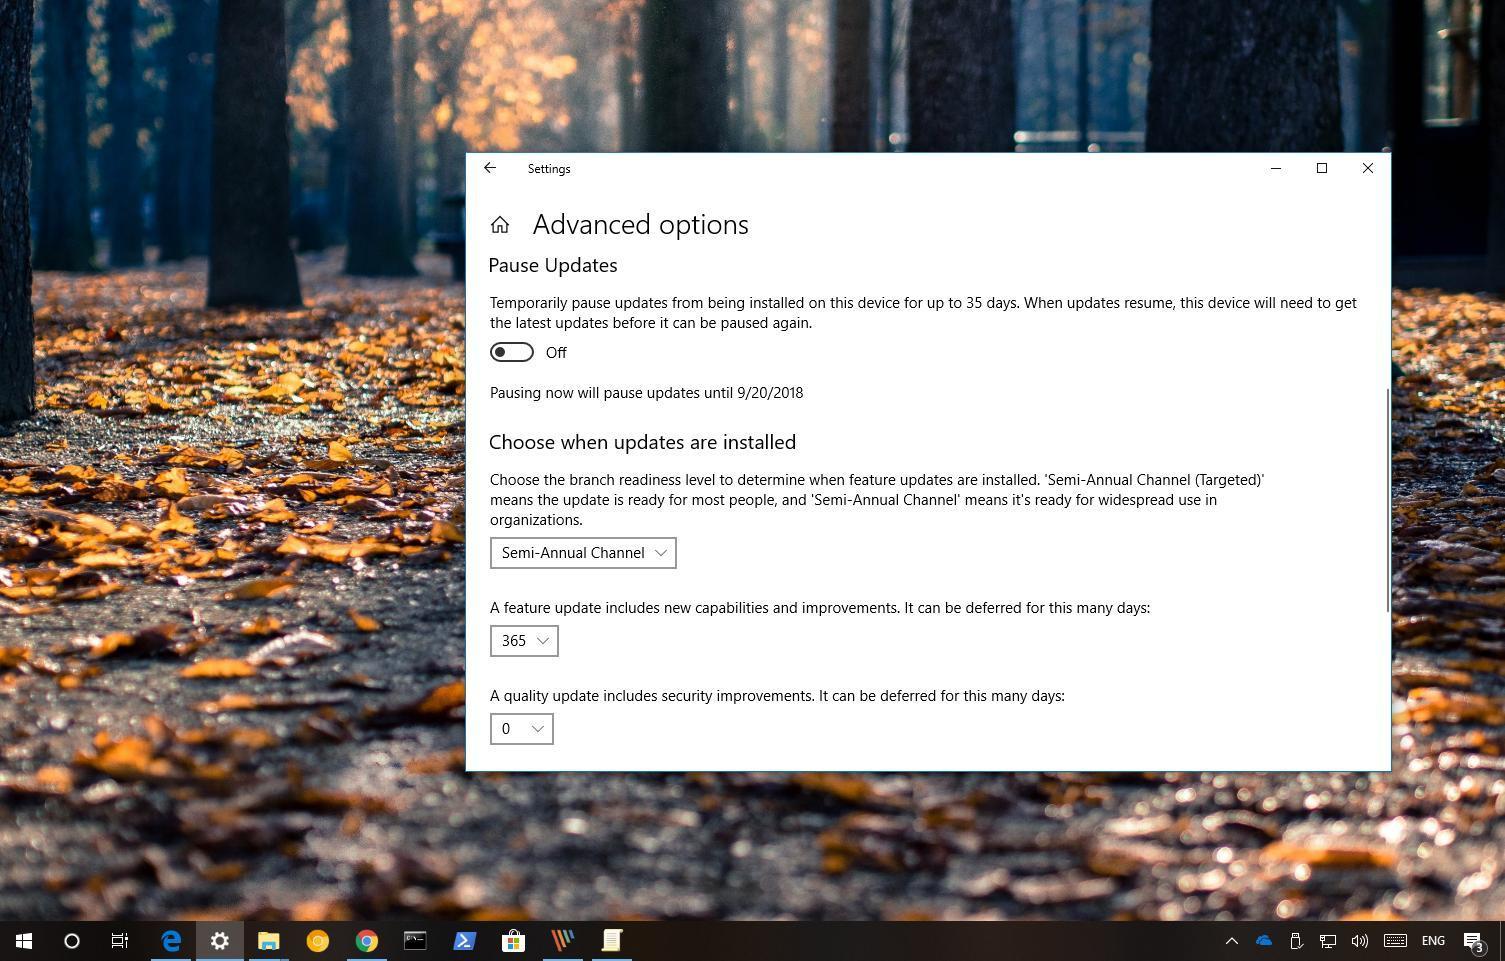 Defer Windows 10 version 1809 (Redstone 5)